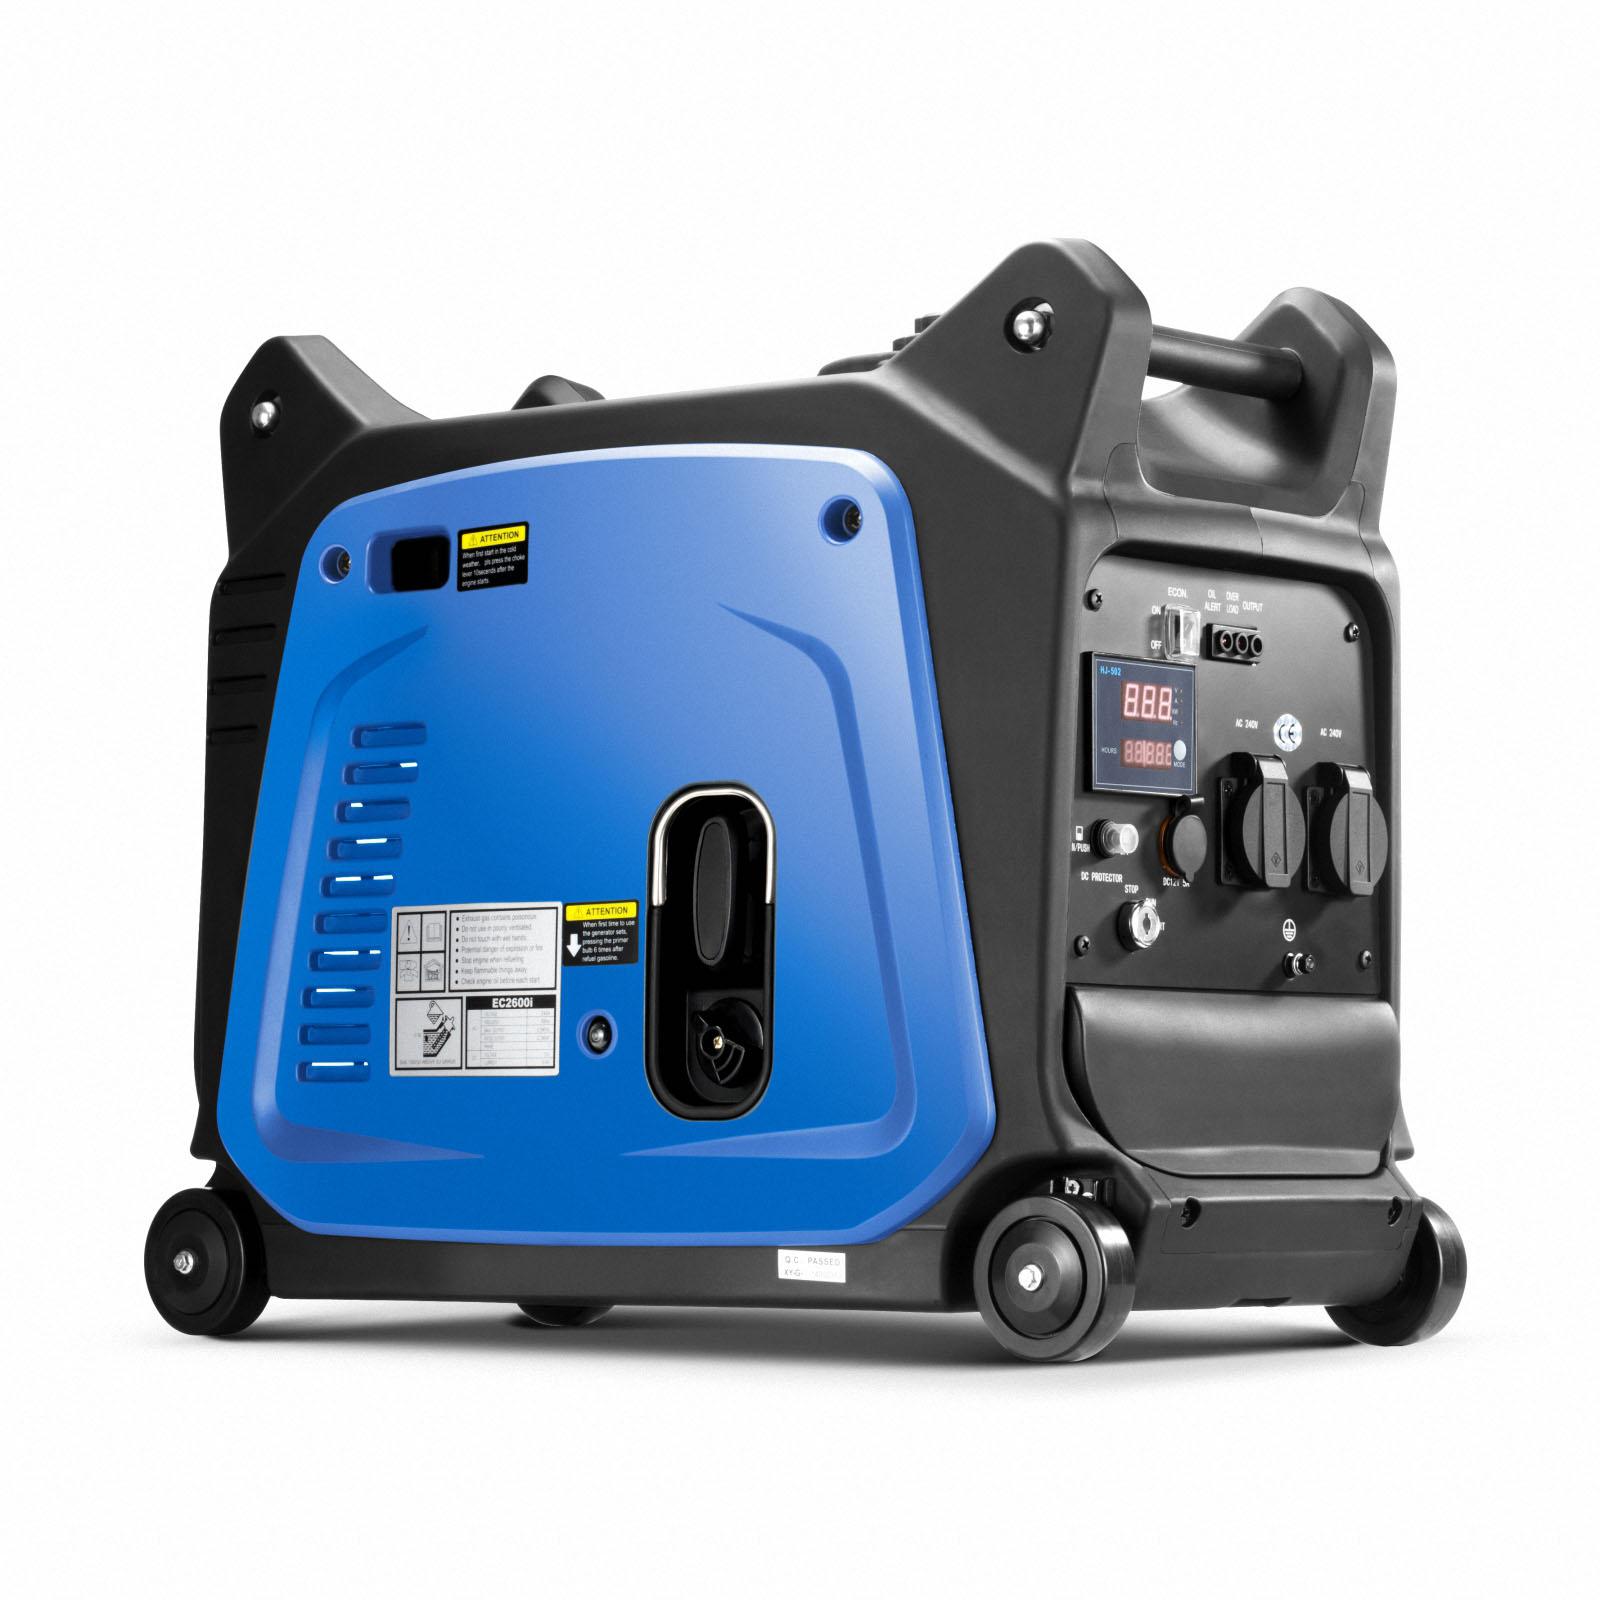 GenTrax Inverter Generator 3.5KW Max 12v Remote Start Portable Petrol Camping 2